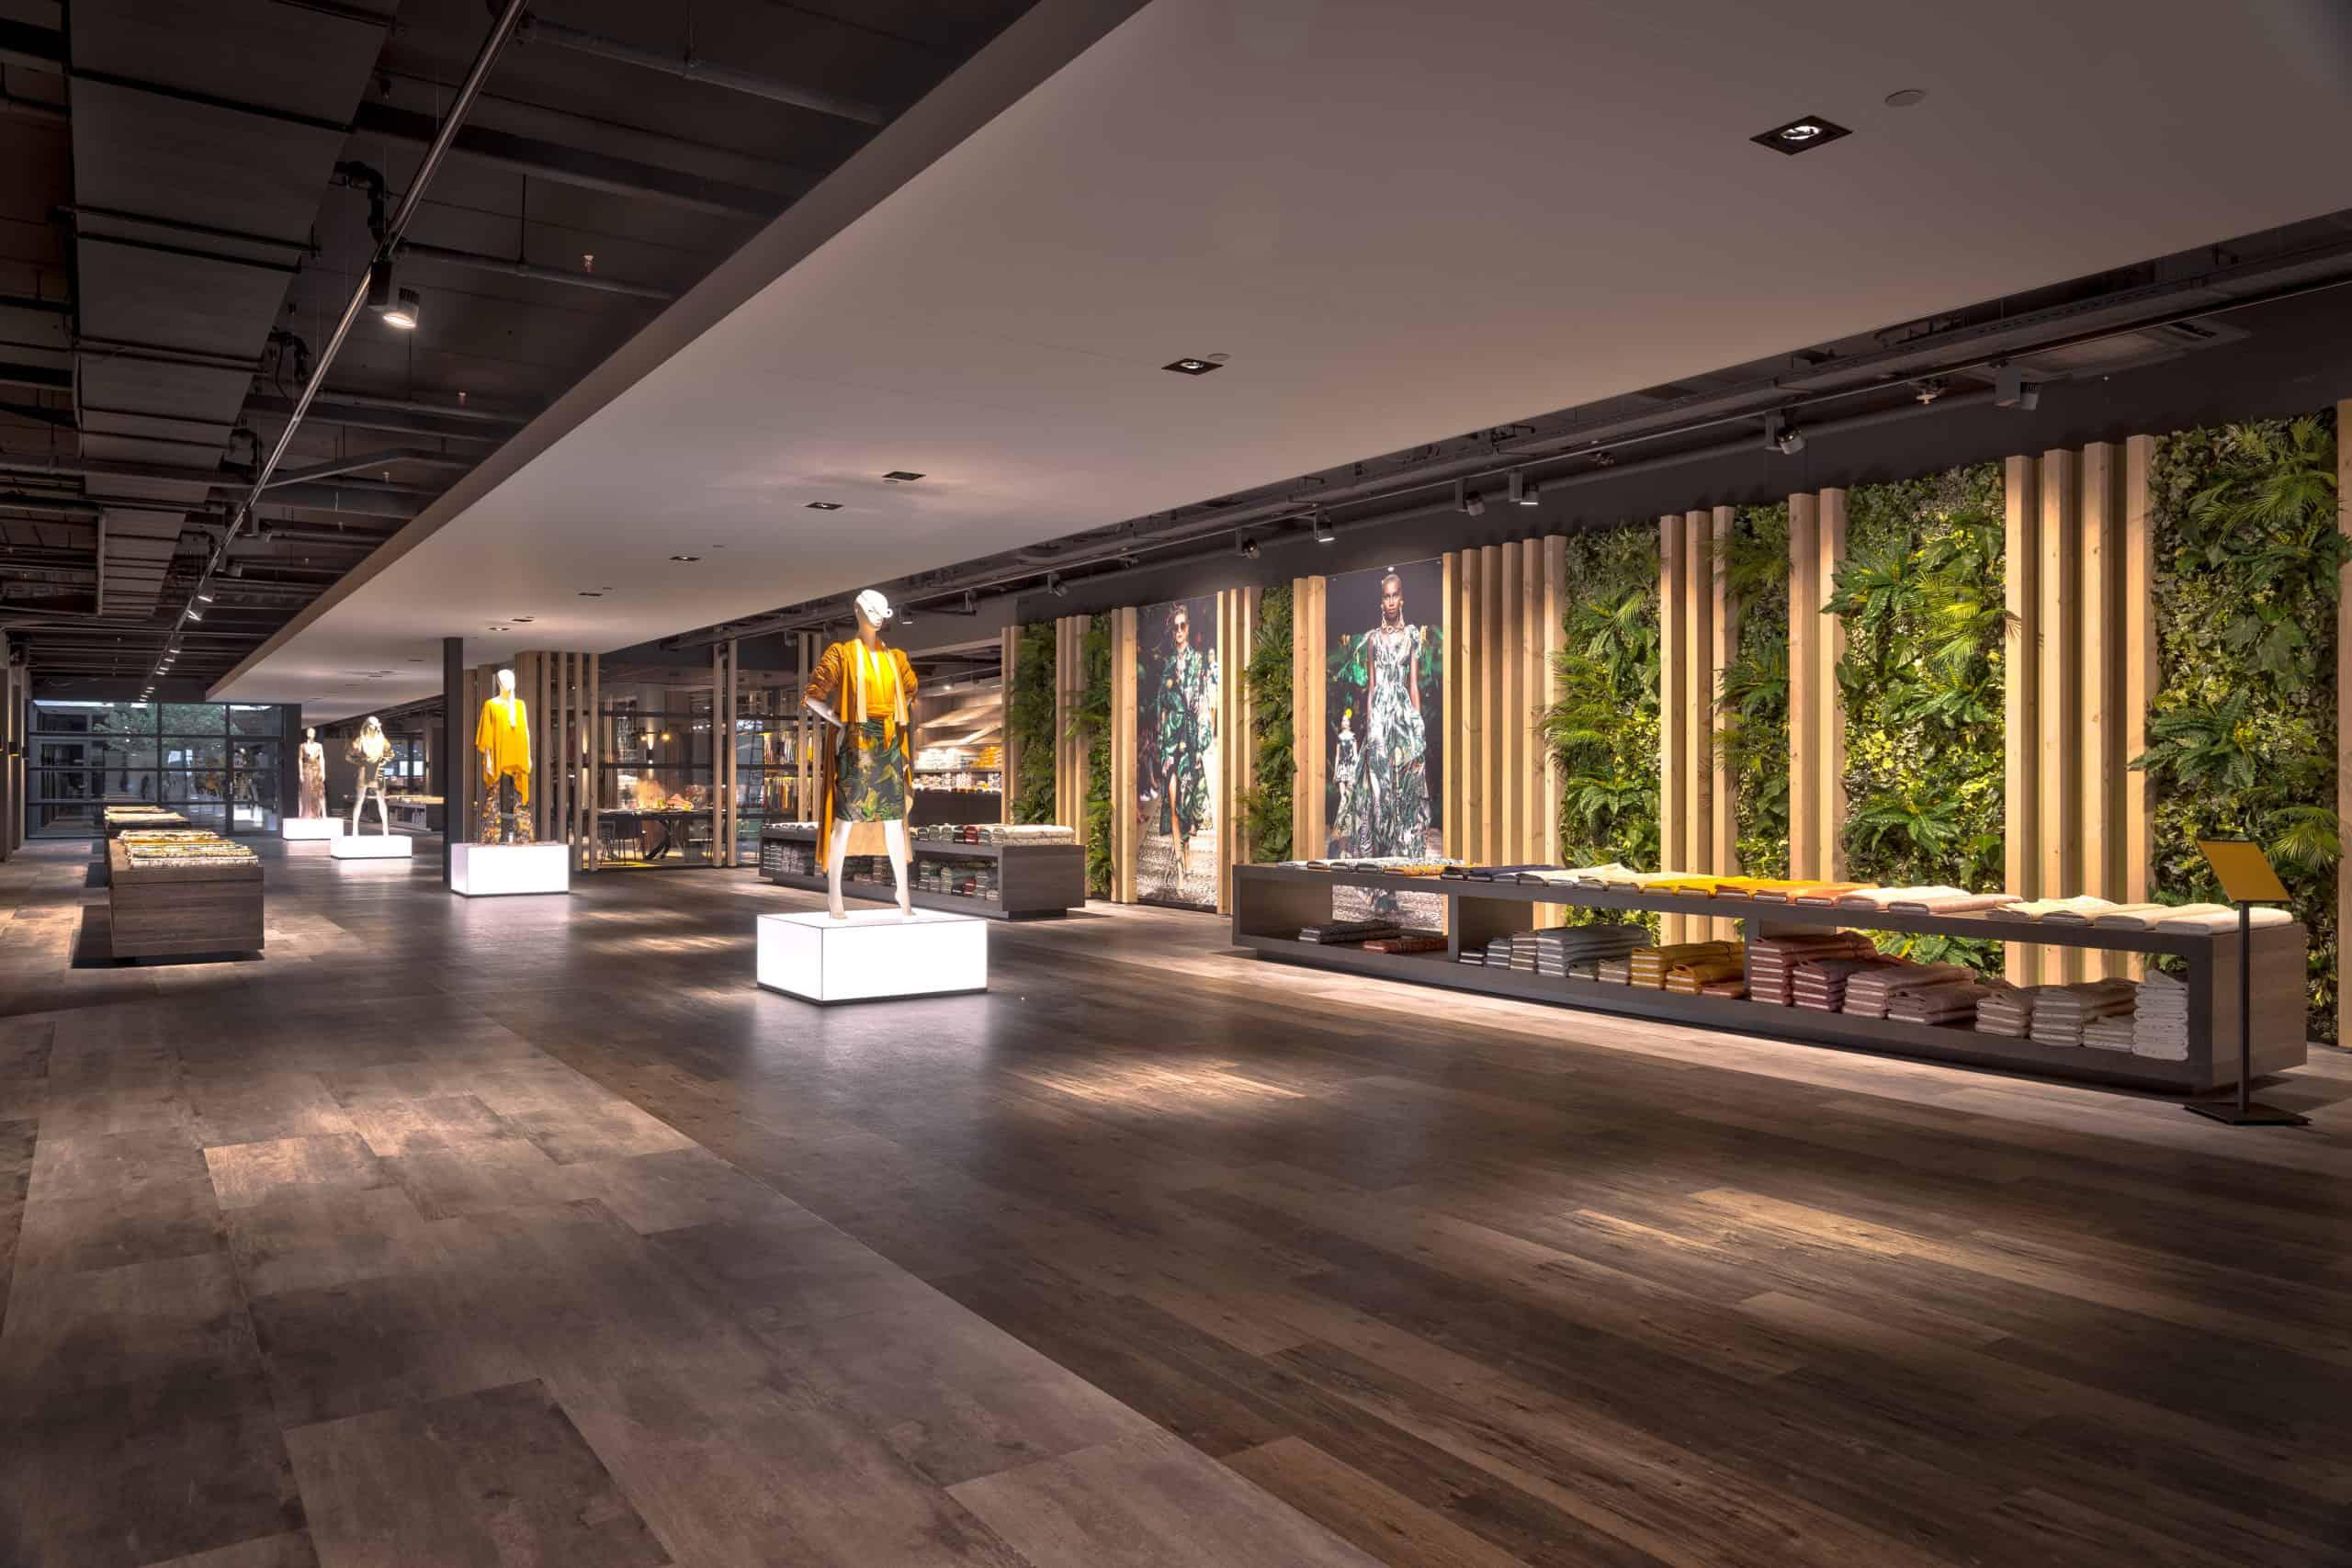 interieurarchitect Wildenberg ontwerp showroom Knipidee Almere plantwand wsb maretti iboma kerastone objectflor kopie